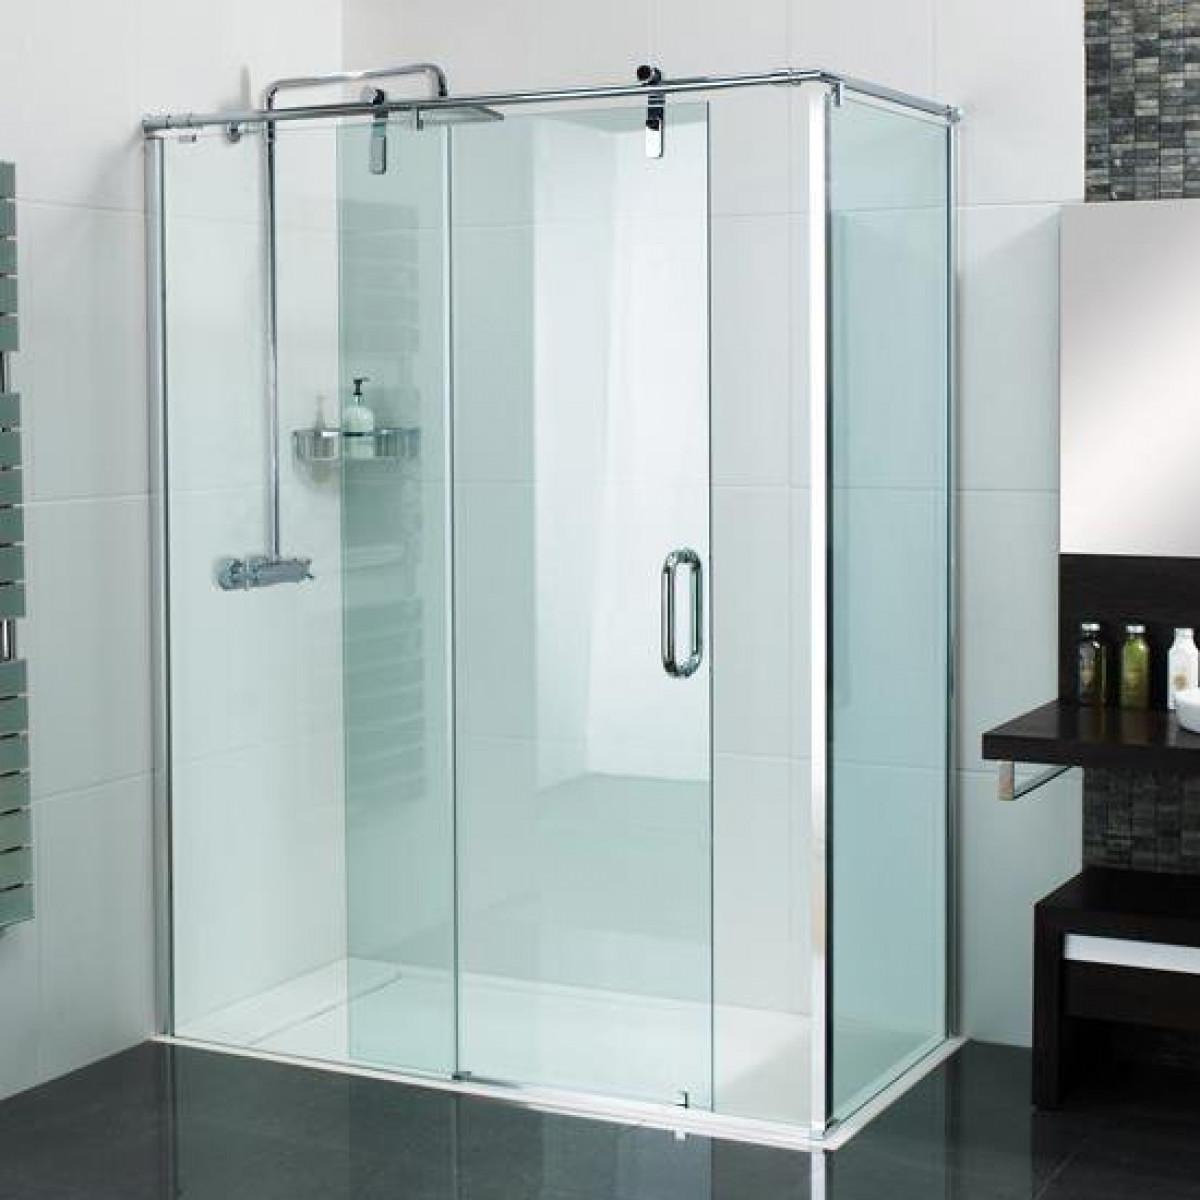 Roman Decemx Sliding Shower Door 1200 X 900mm Corner Fitting With Curved Hardware